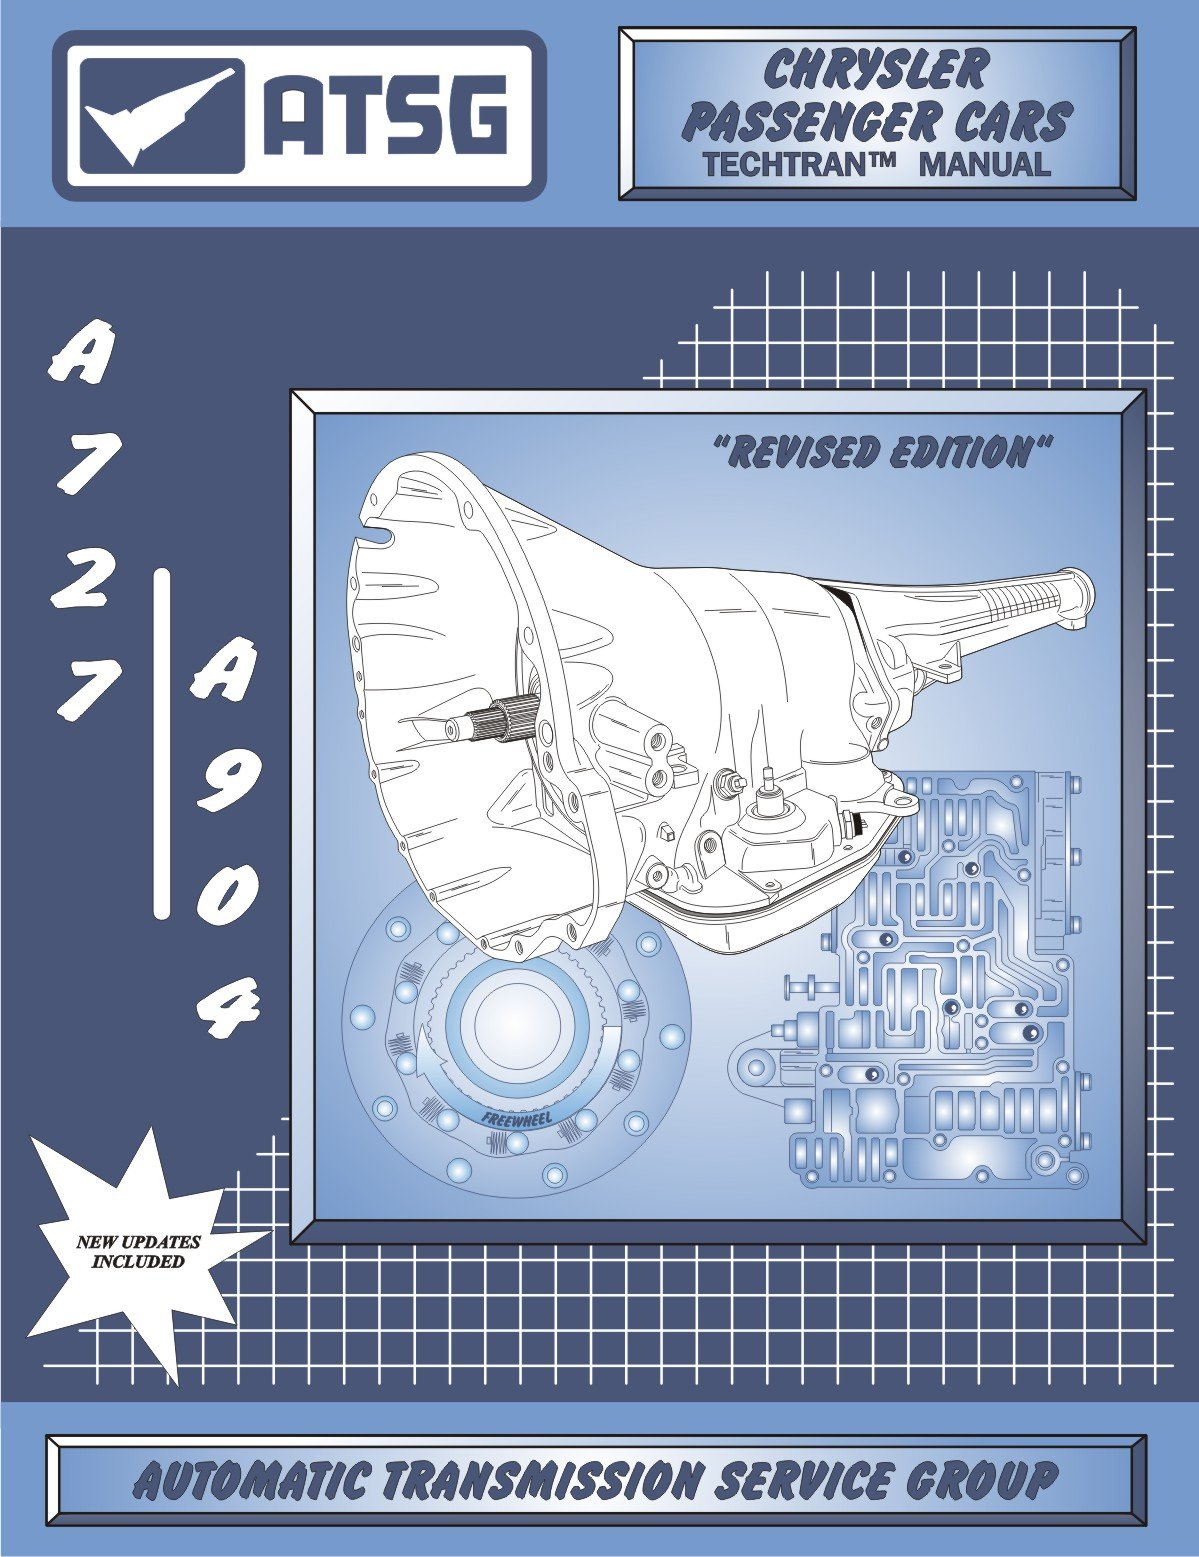 ATSG Chrysler Torqueflight A-727 A-904, Techtran Manual (1960 & Up): Robert  D. Cherrnay: Amazon.com: Books